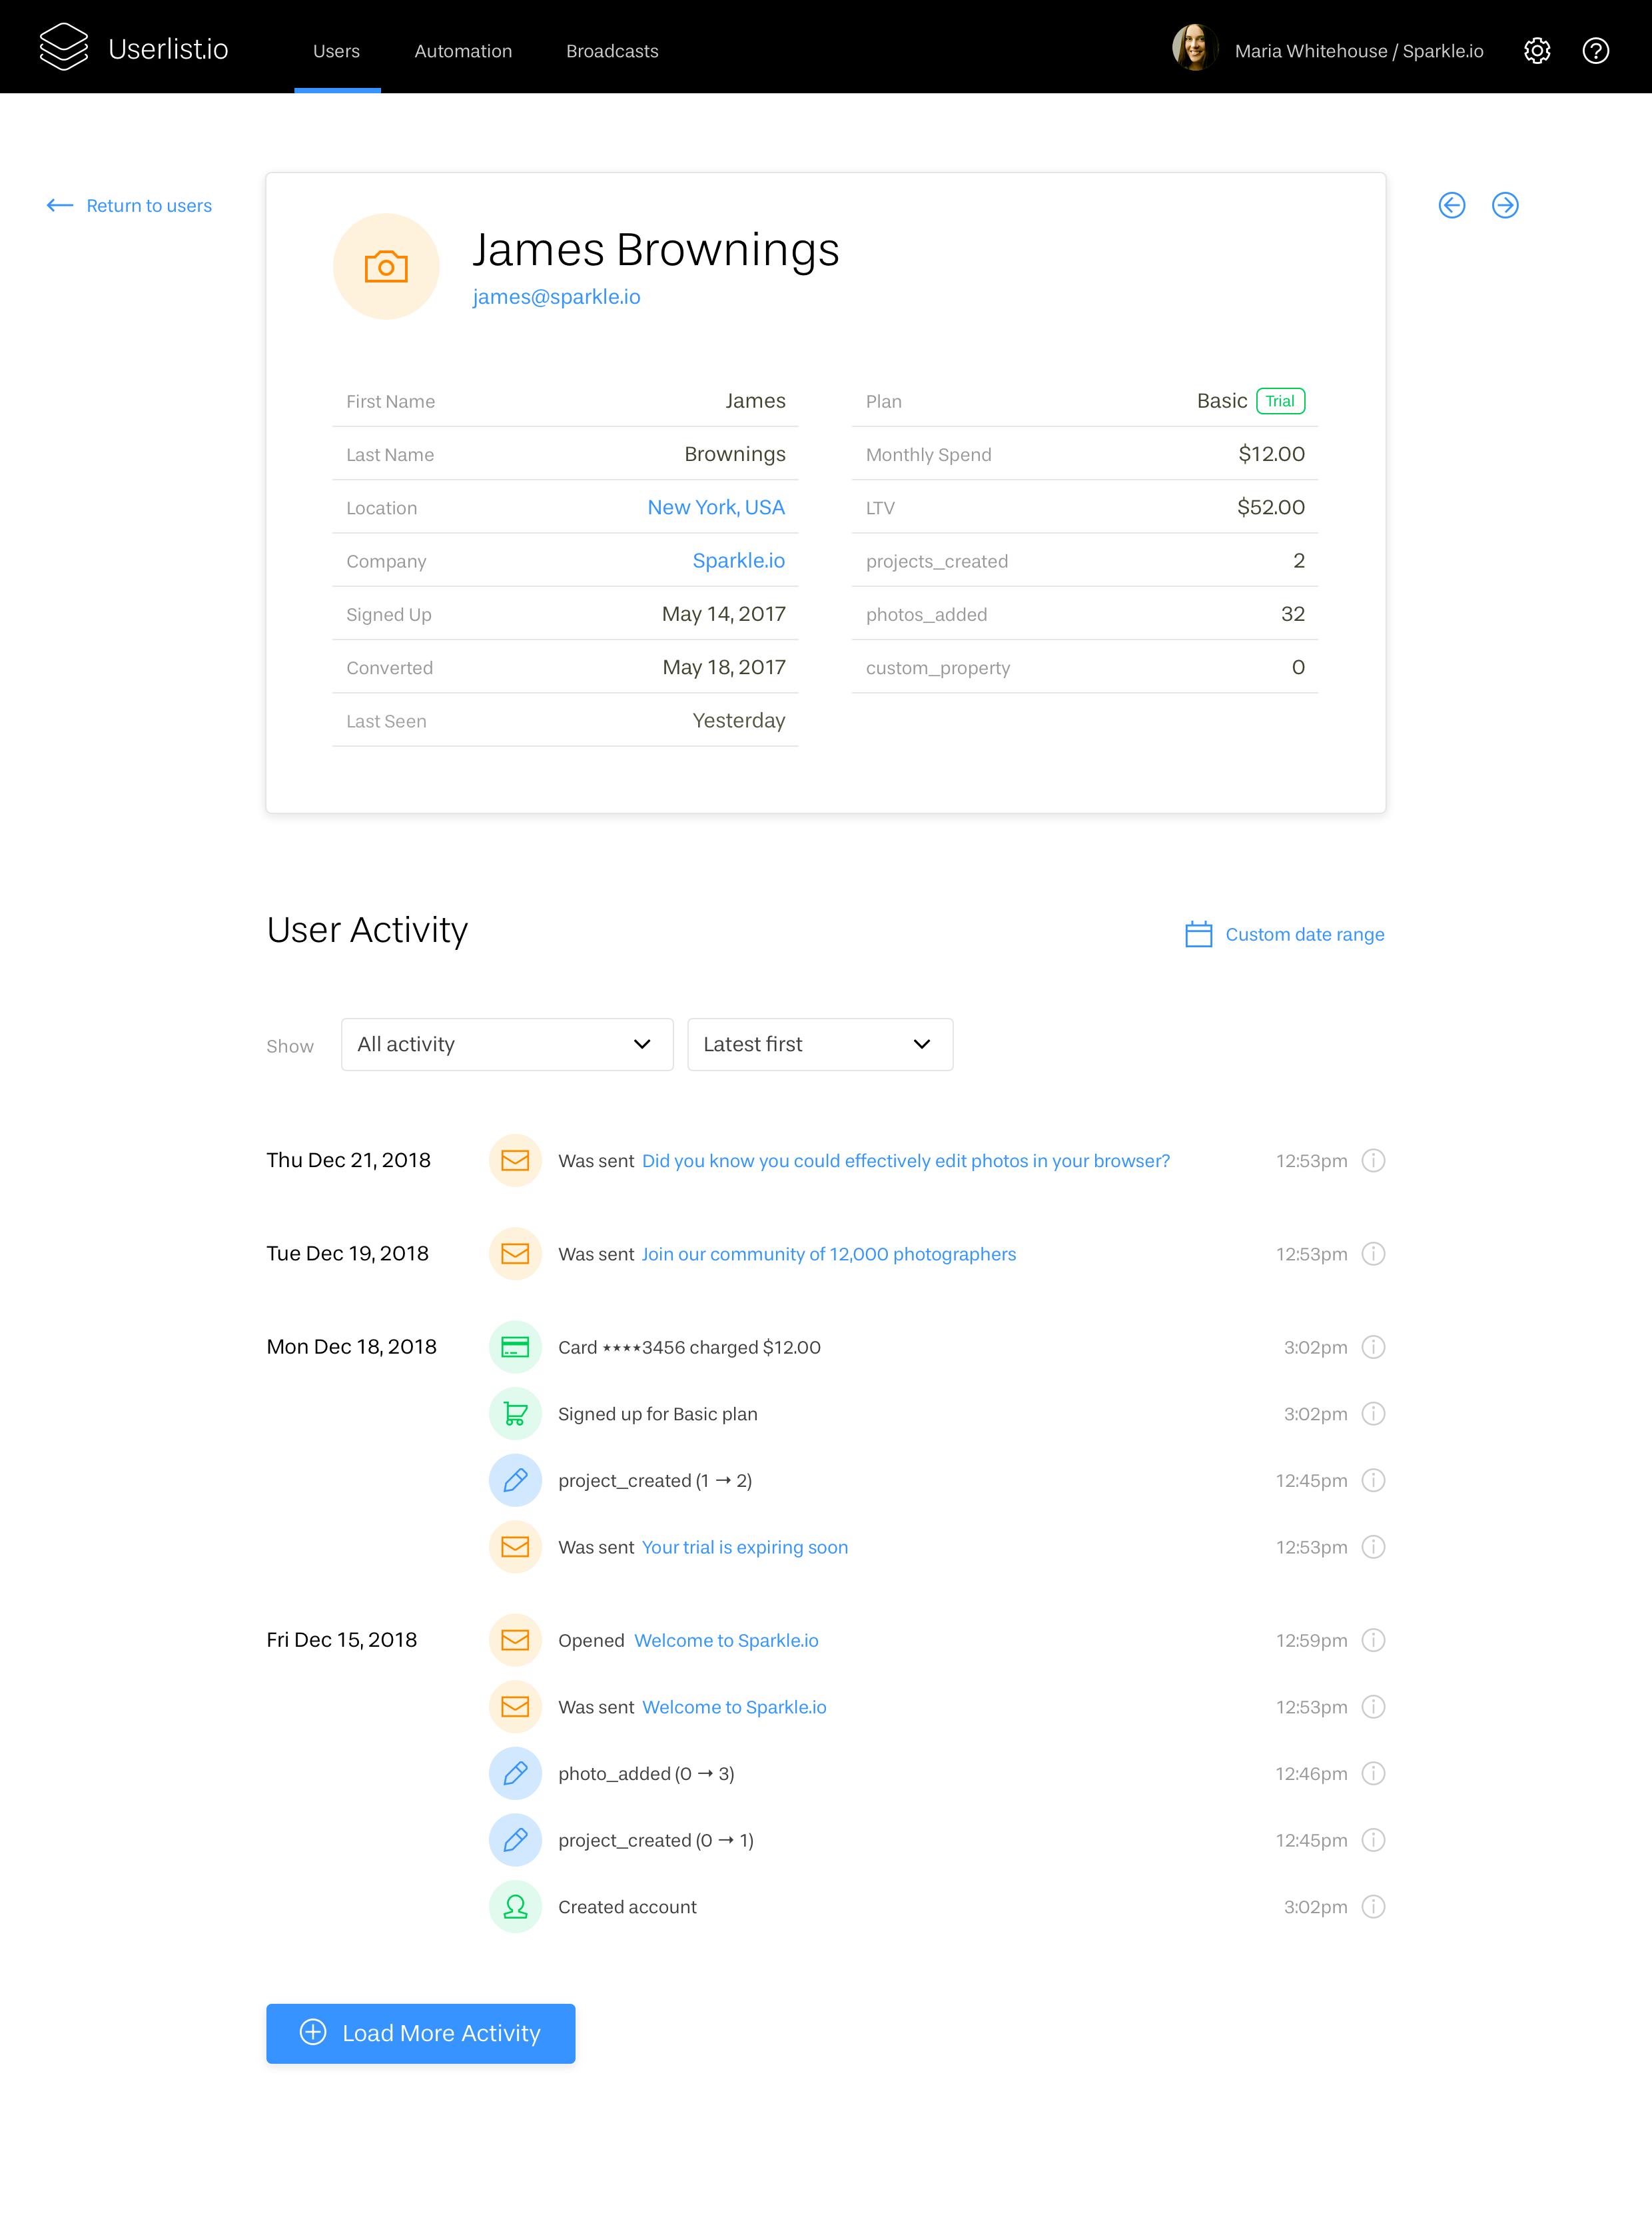 User Profile in Userlist